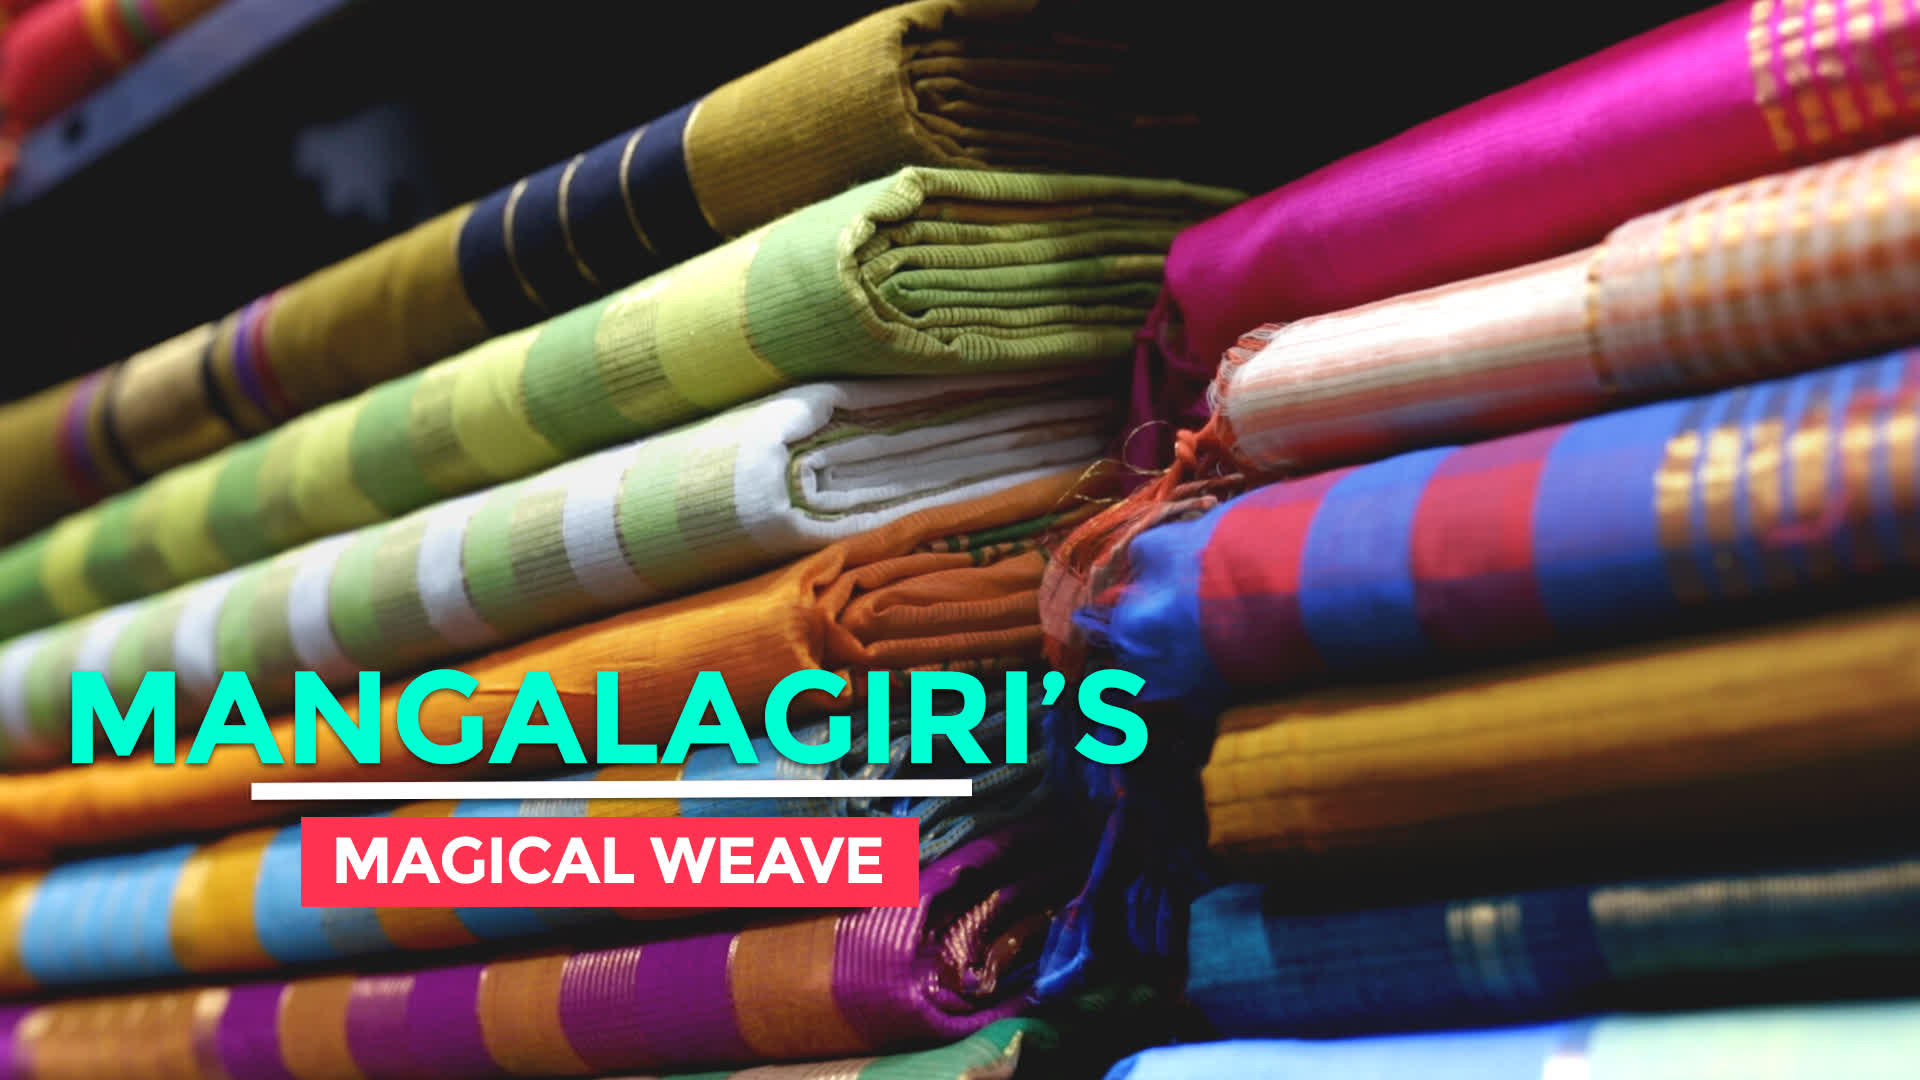 Mangalagiri's Magical Weave